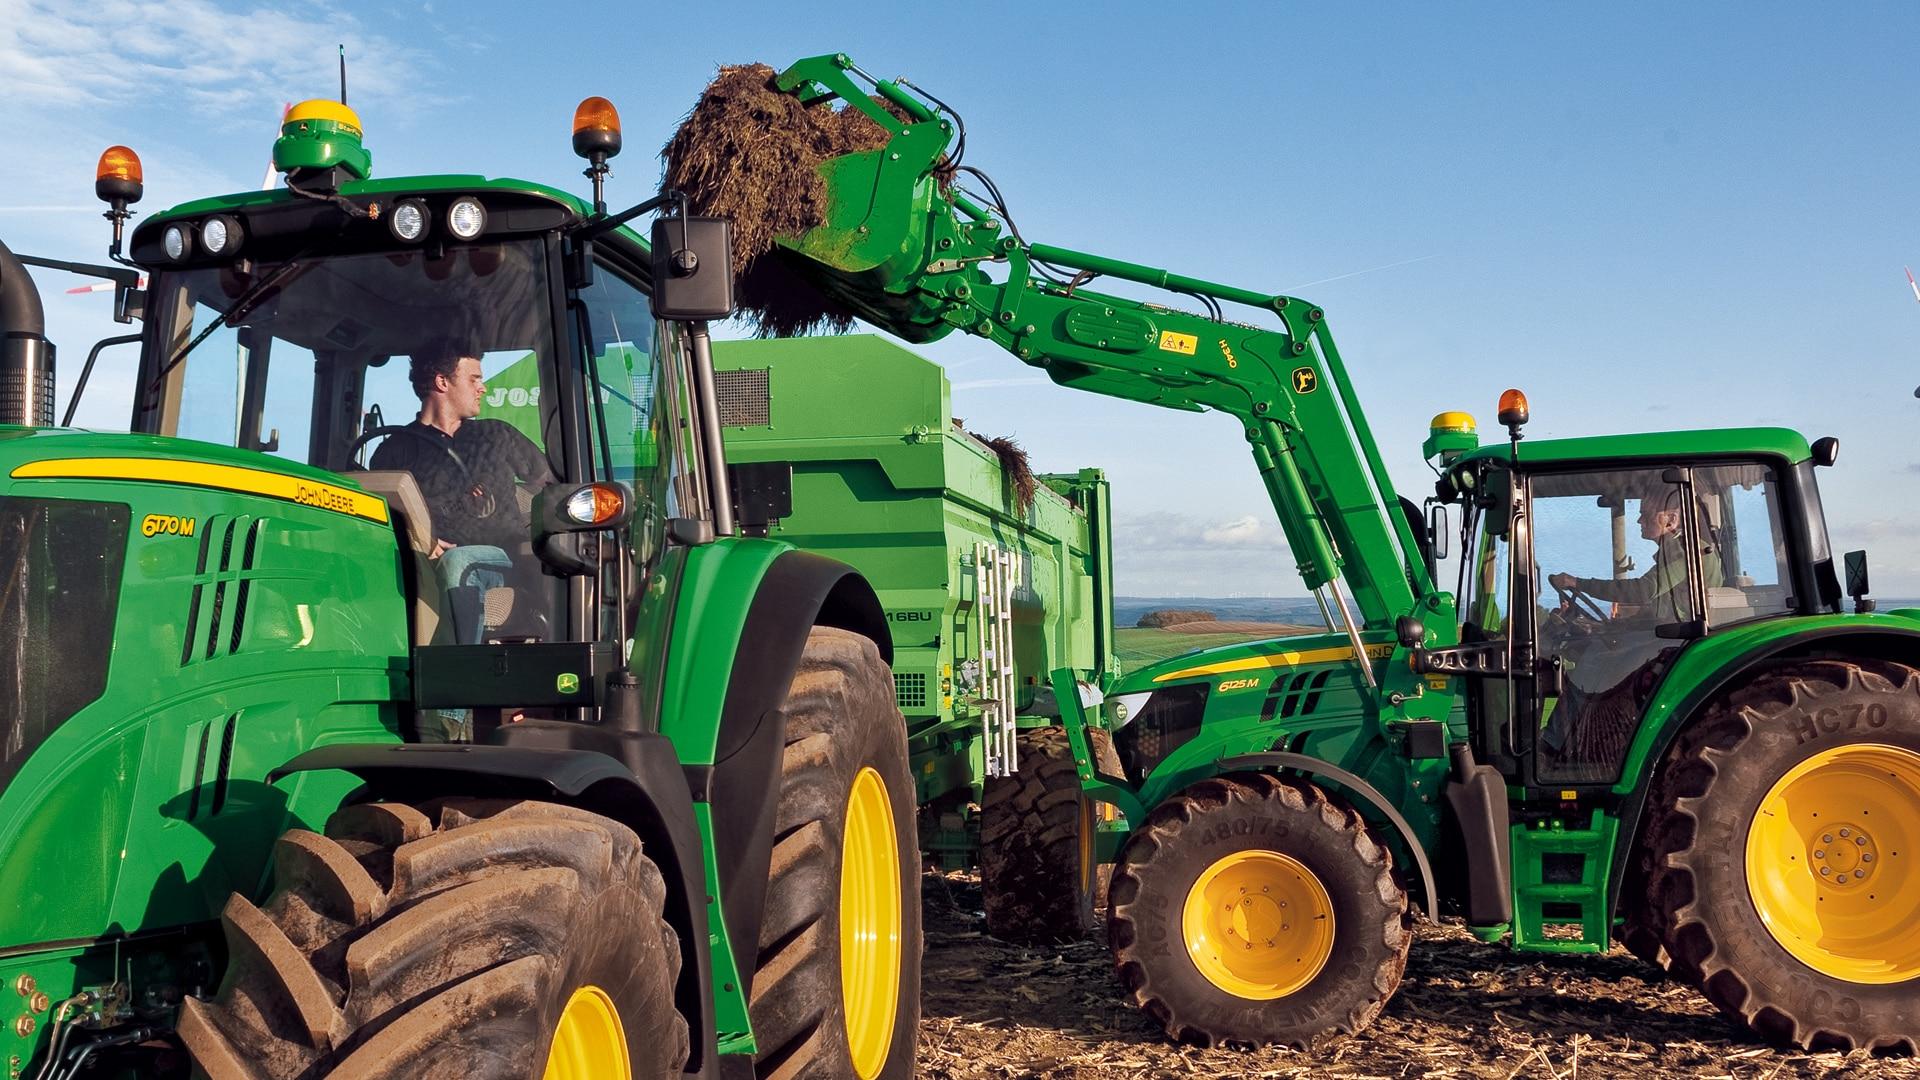 frontier-livestock-equipment-r2b009989